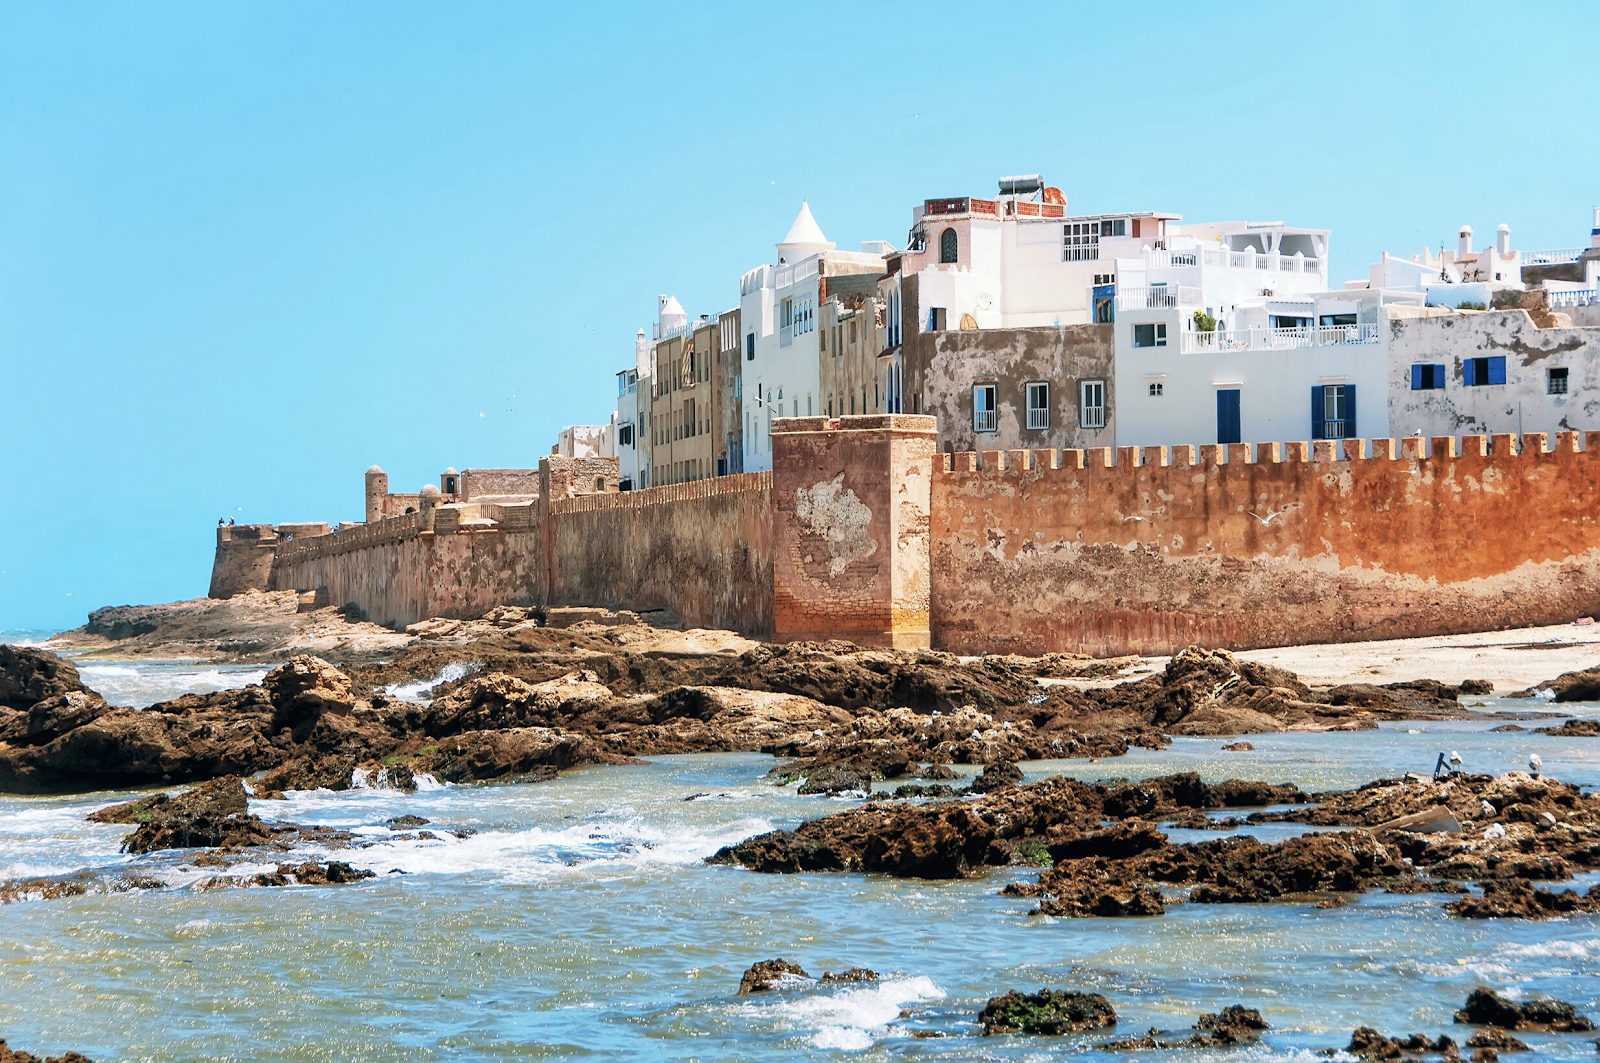 Moroccan festival MOGA announces final line-up for 2019 inc. Raresh, Amine K, Maher Daniel ile ilgili görsel sonucu